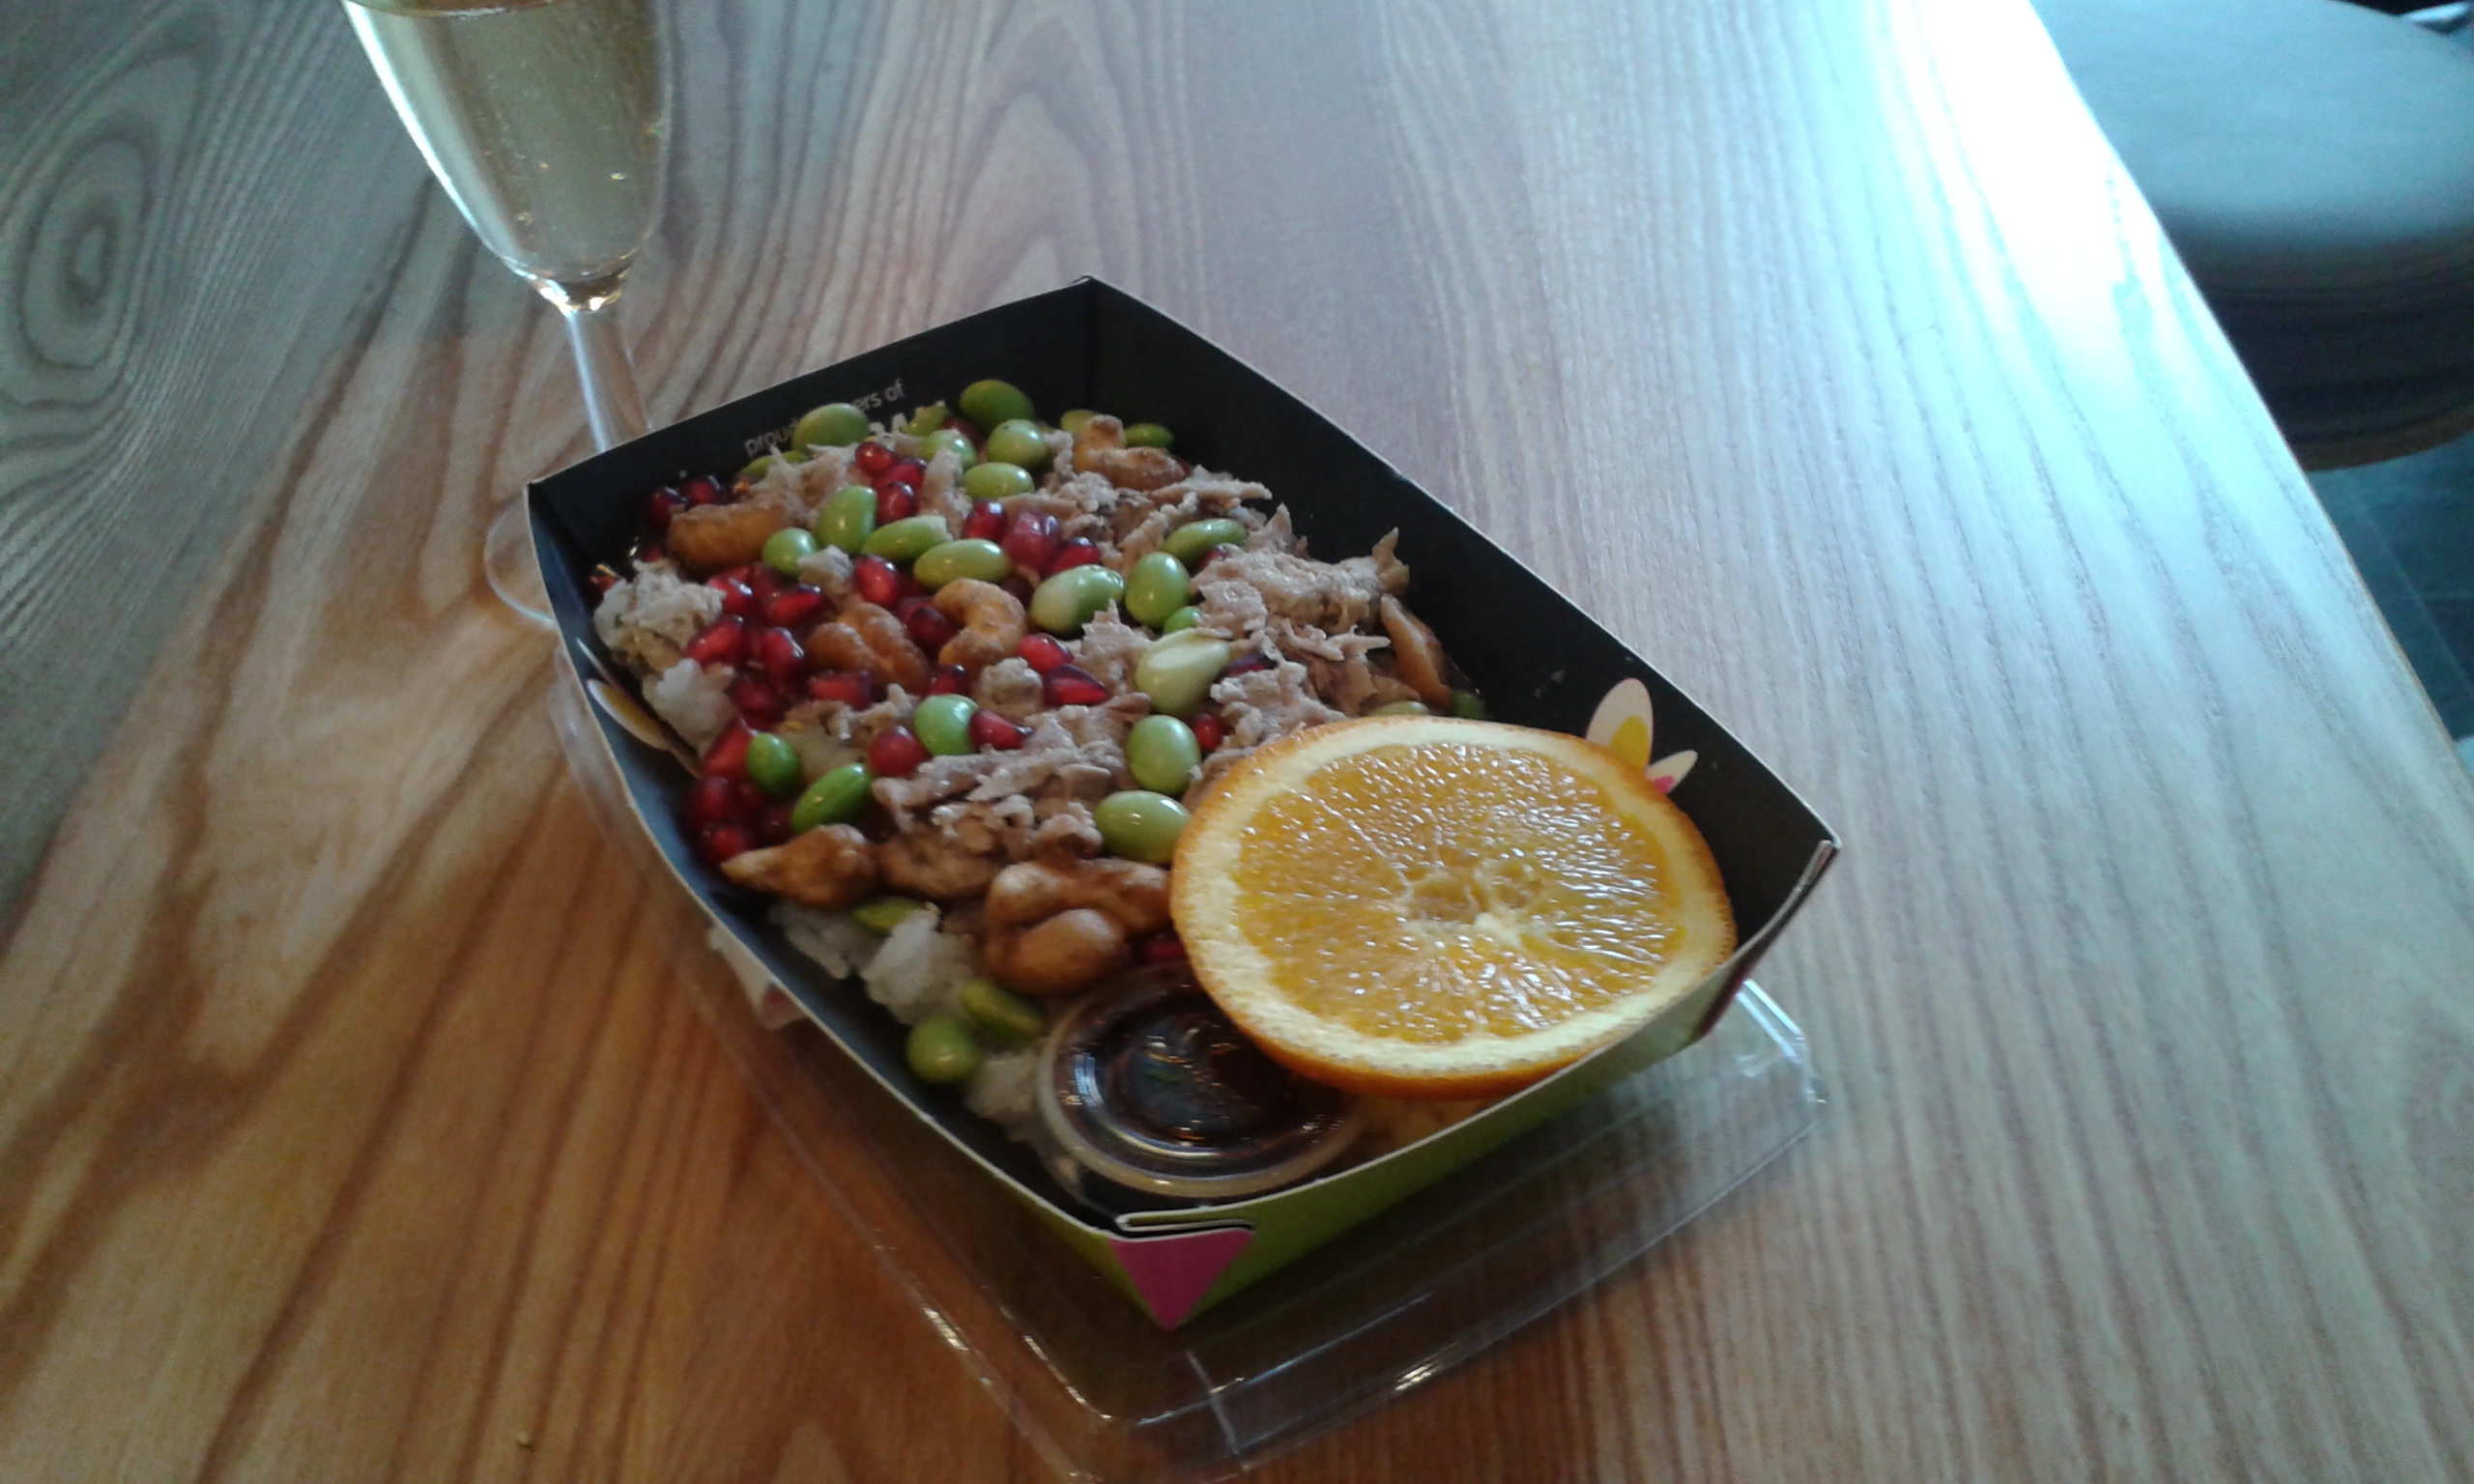 Itsu brighton menu review what to eat for Anatolia cuisine brighton